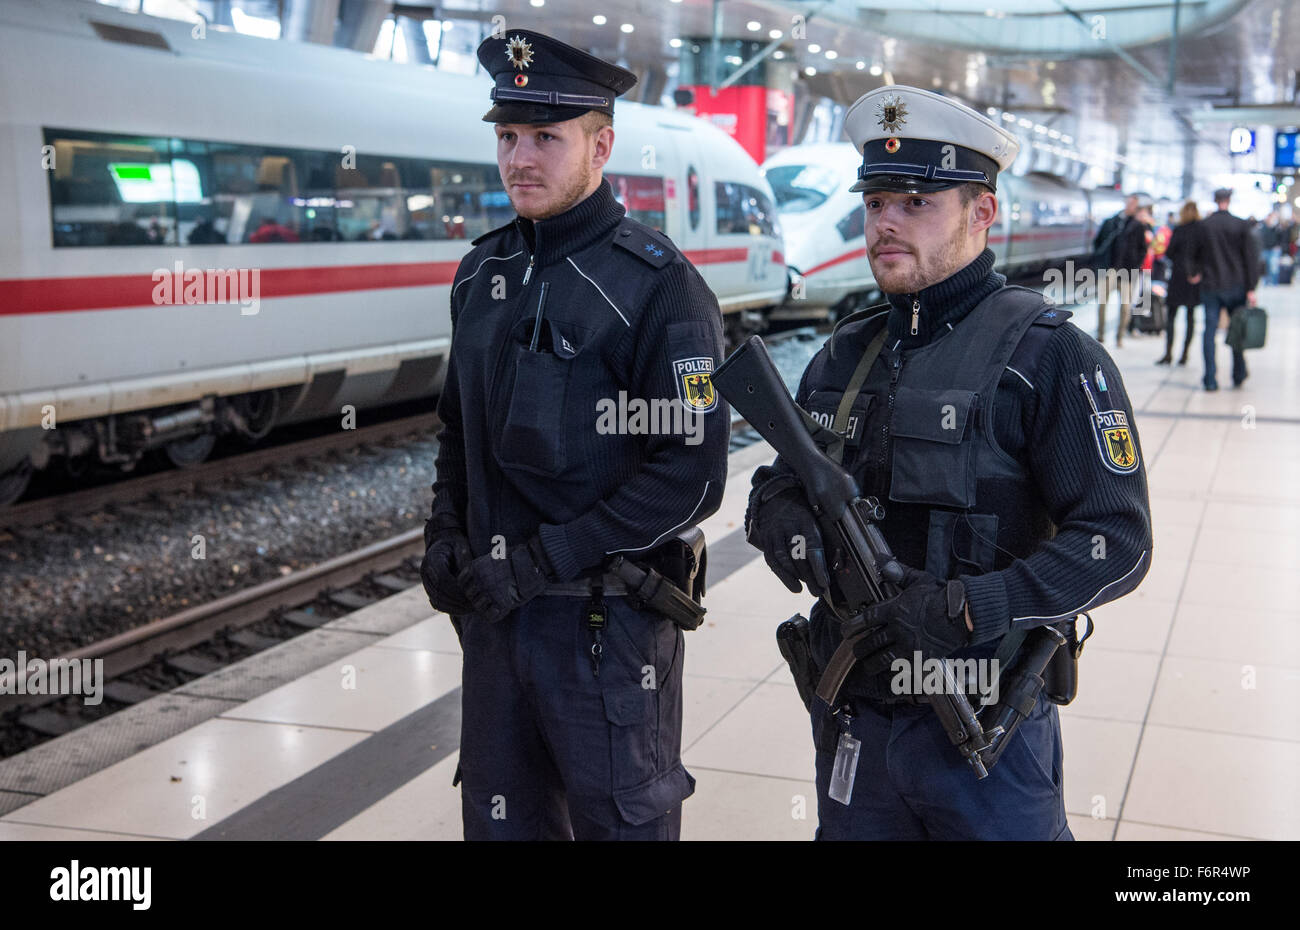 Frankfurt, Germany. 19th November, 2015. A federal police officer ...